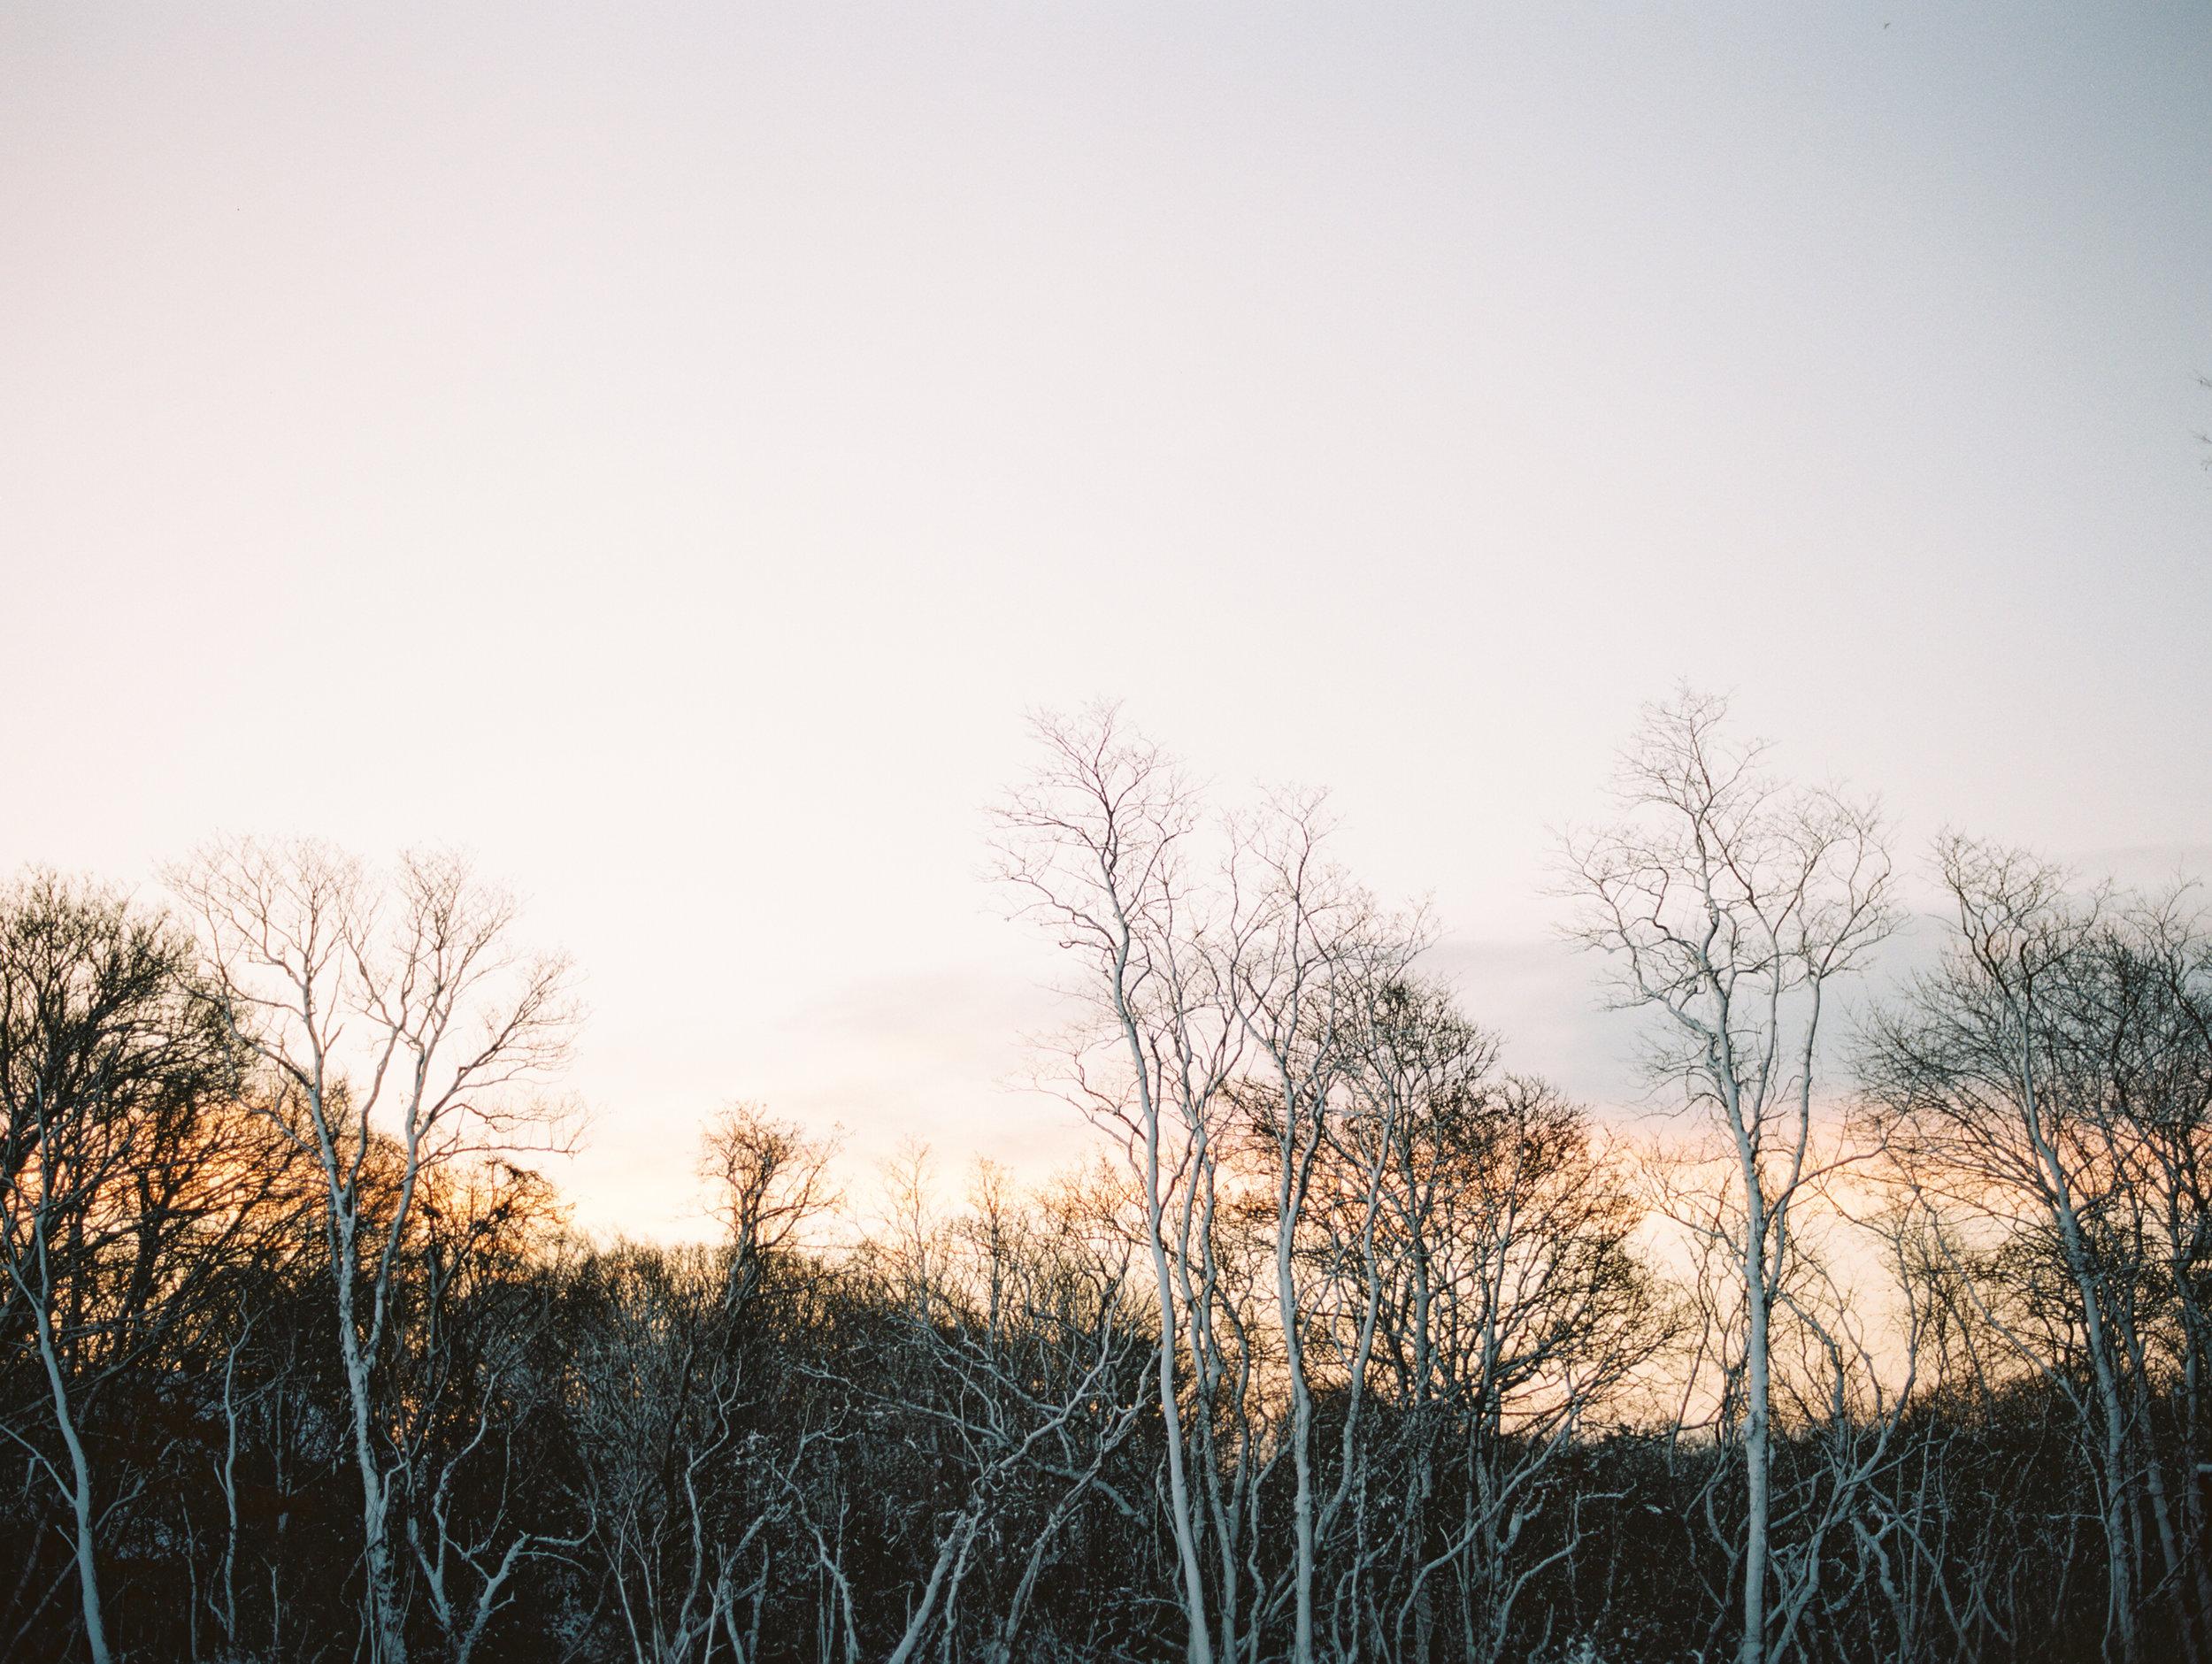 015-fine-art-photography-le-petite-peach-cape-cod-brumley & wells.jpg